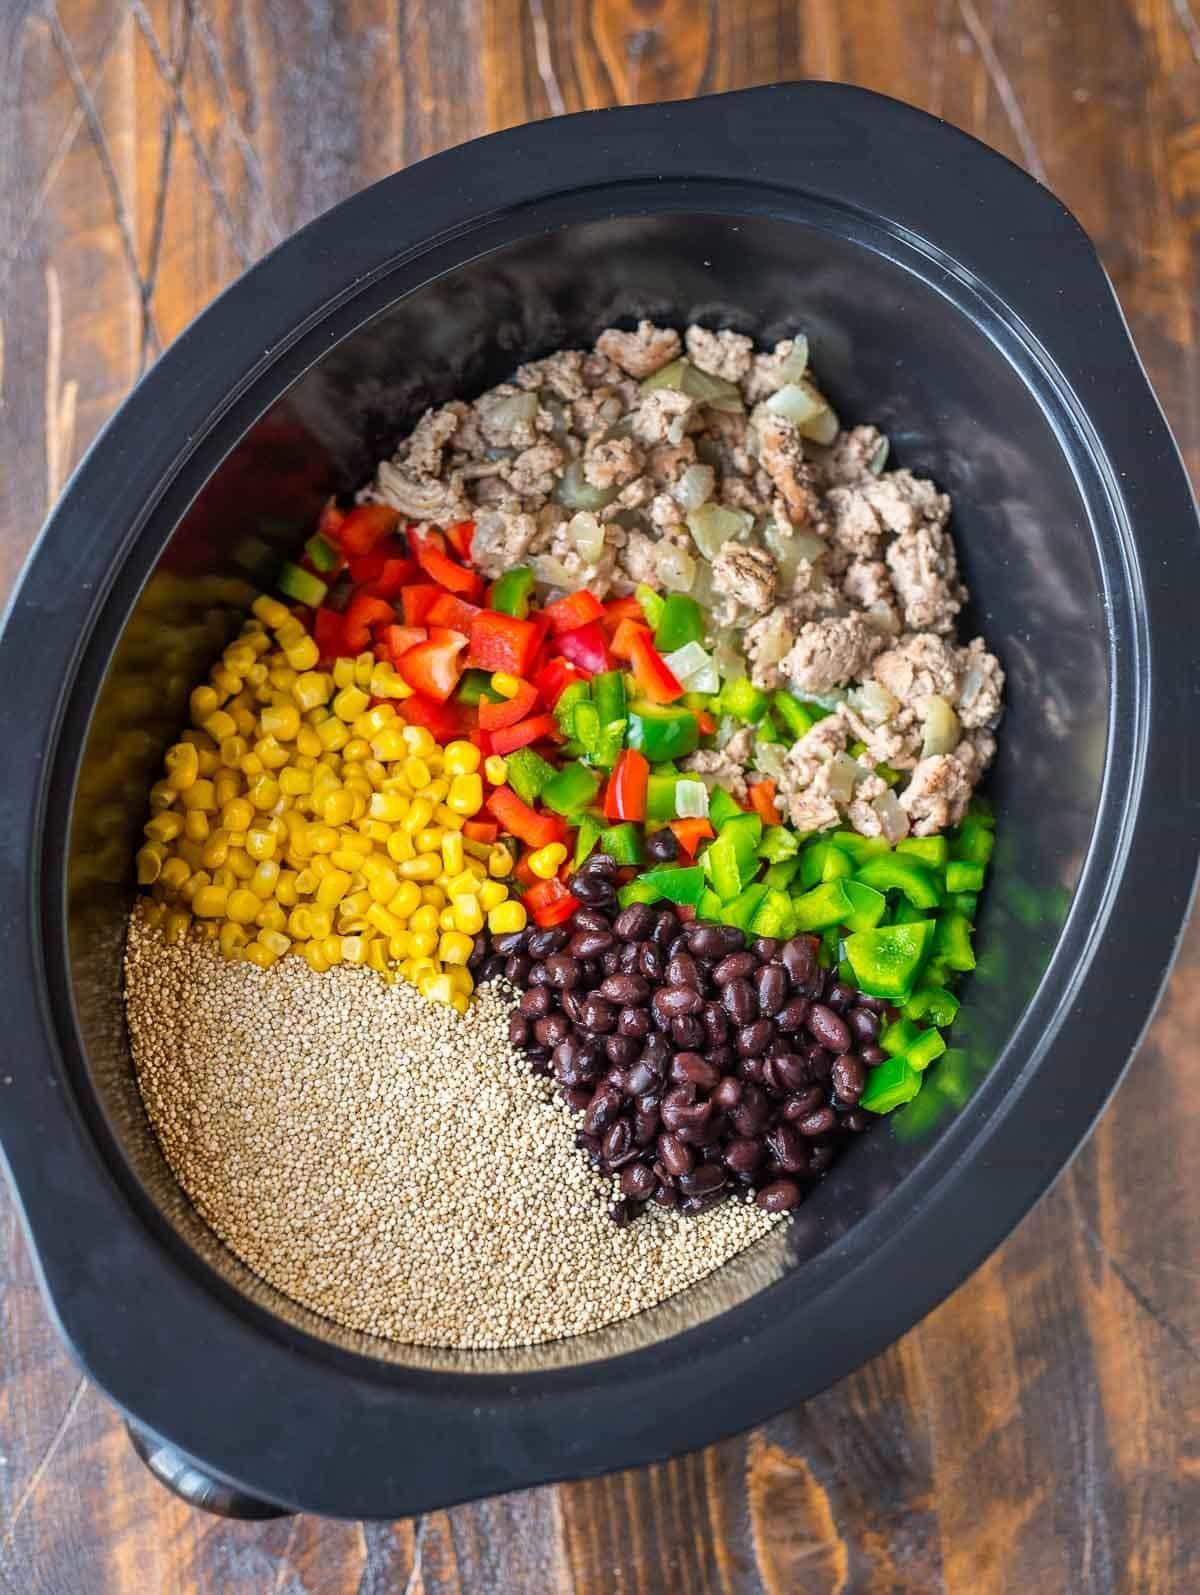 Healthy Ground Beef Crock Pot Recipes  Crock Pot Mexican Casserole